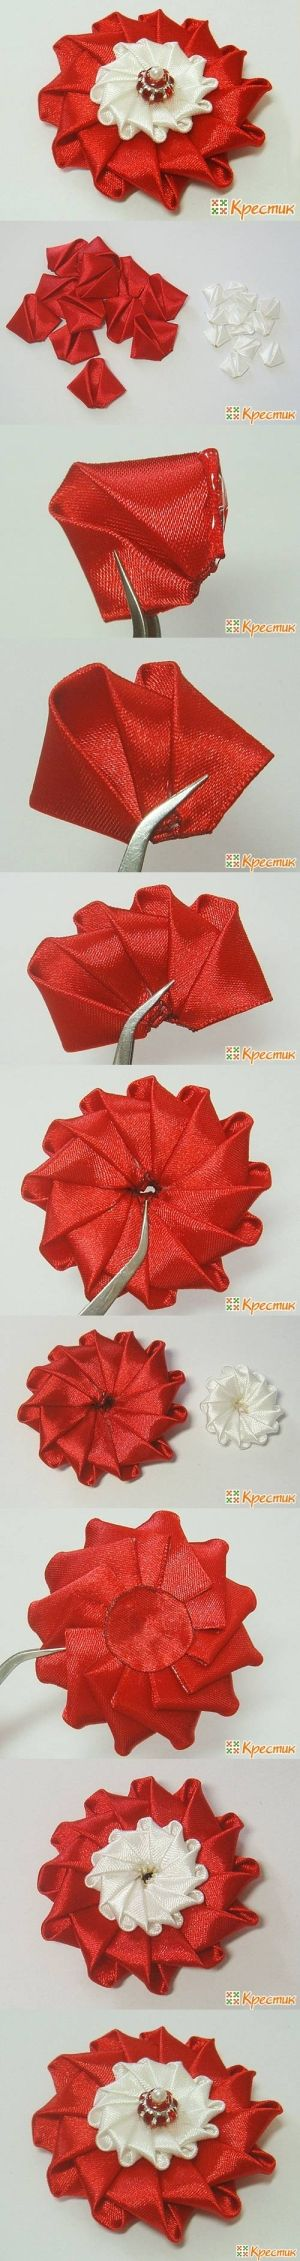 DIY Bright Satin Ribbon Flower DIY Bright Satin Ribbon Flower by diyforever